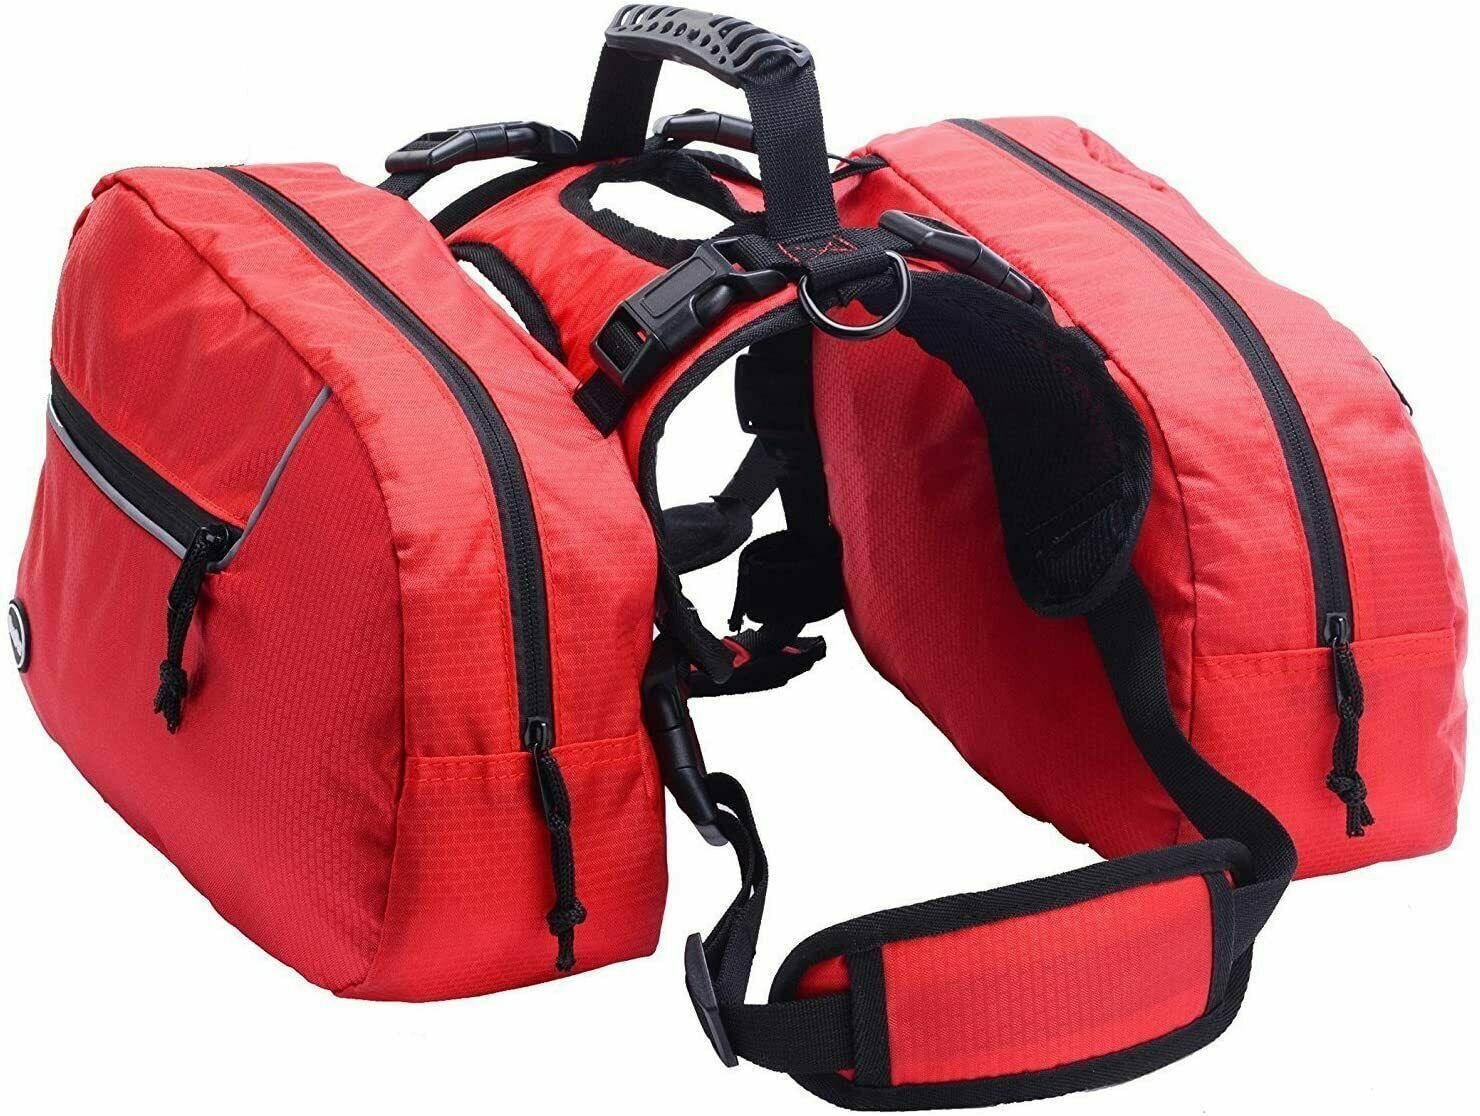 BINGPET Large Dog Harness Backpack Doggie Saddlebags with 2